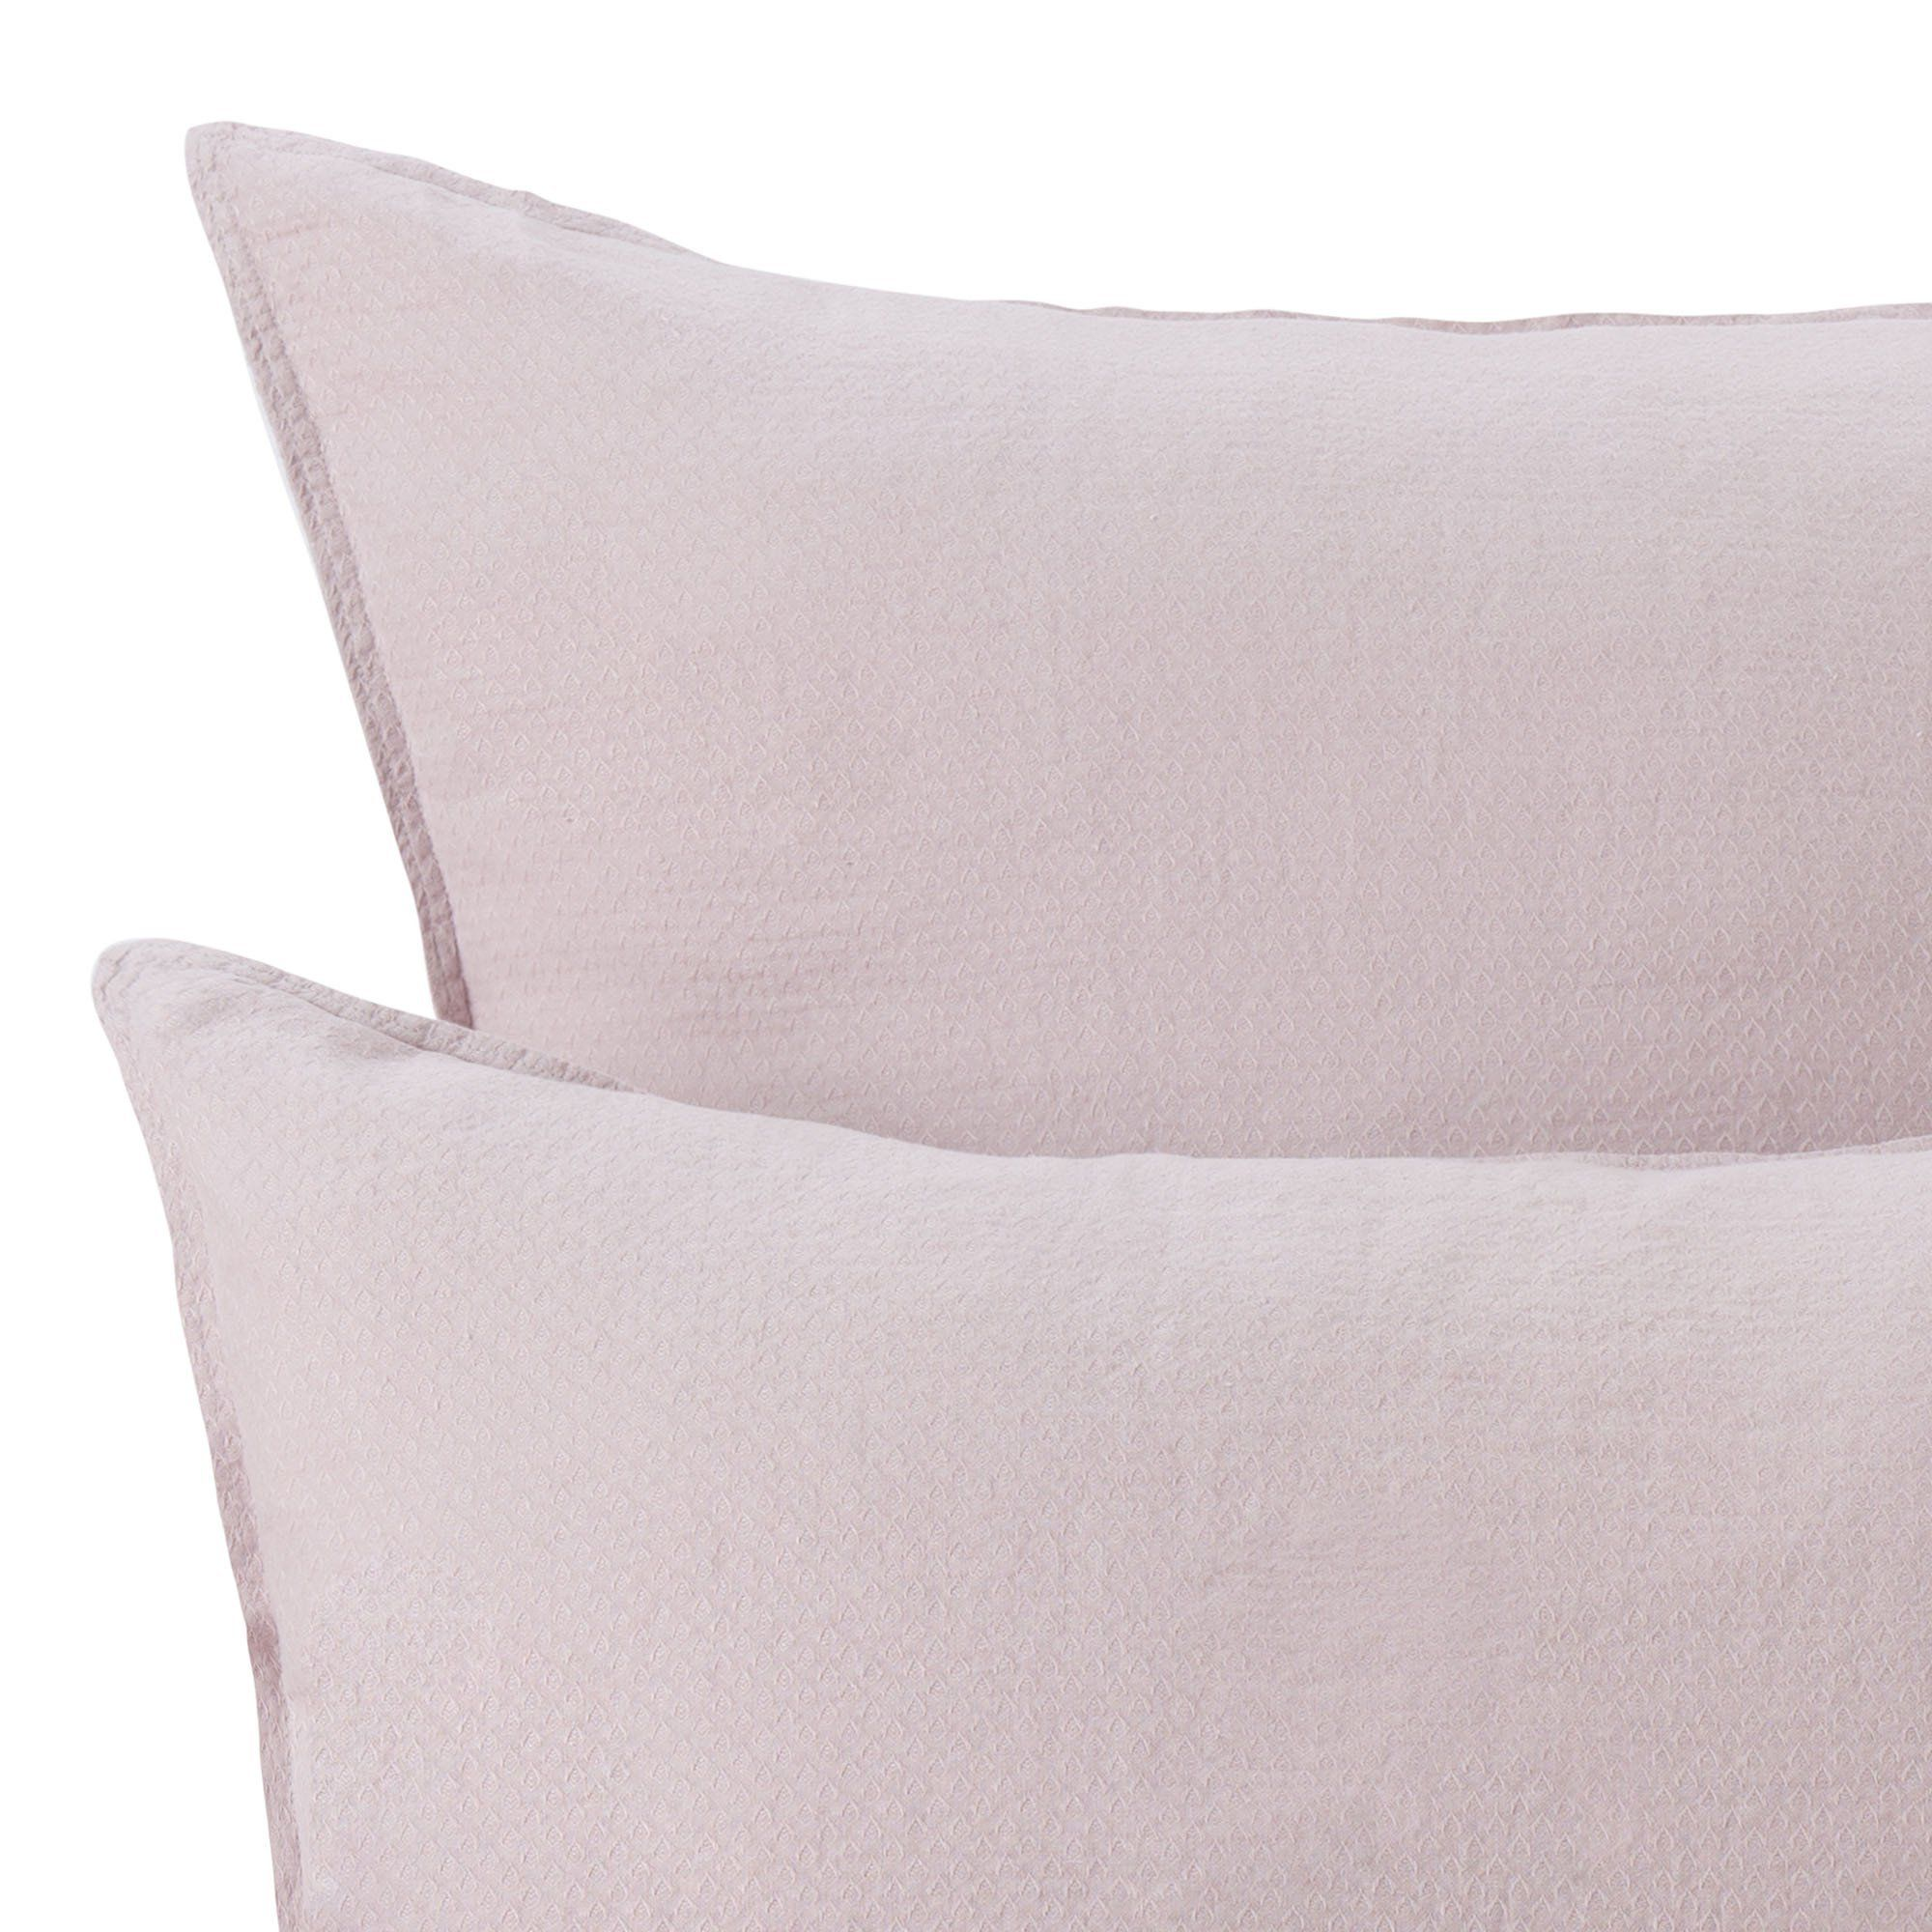 Leinen Bettwasche Lousa Zartrosa 155x220 Cm Leinenbettwasche